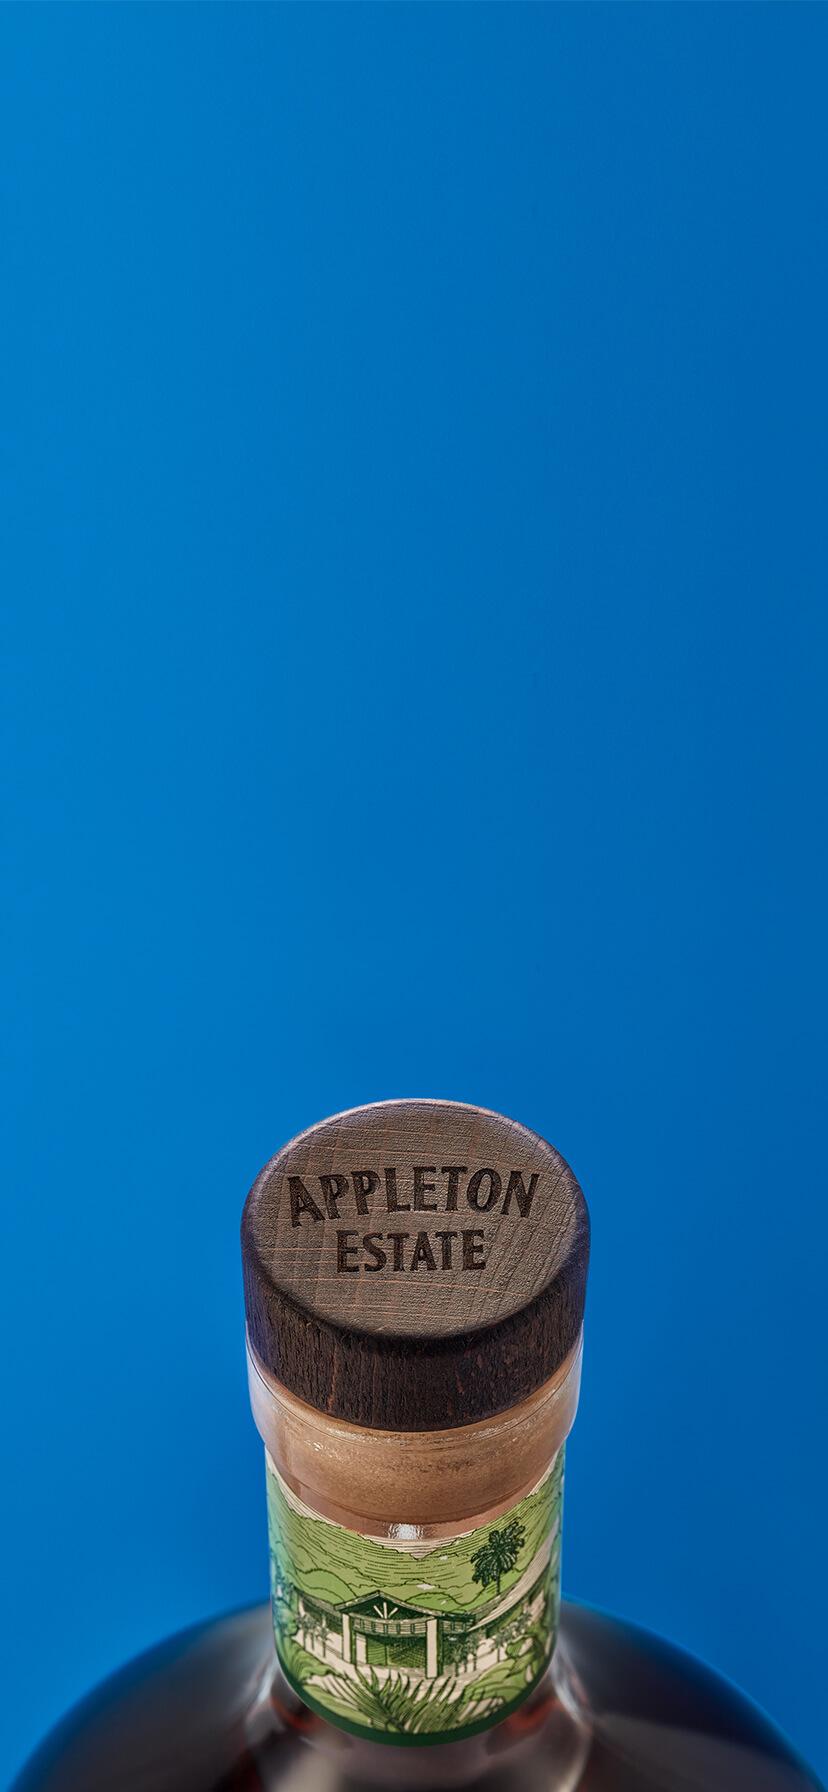 Appleton Estate Signature Blend Aroma